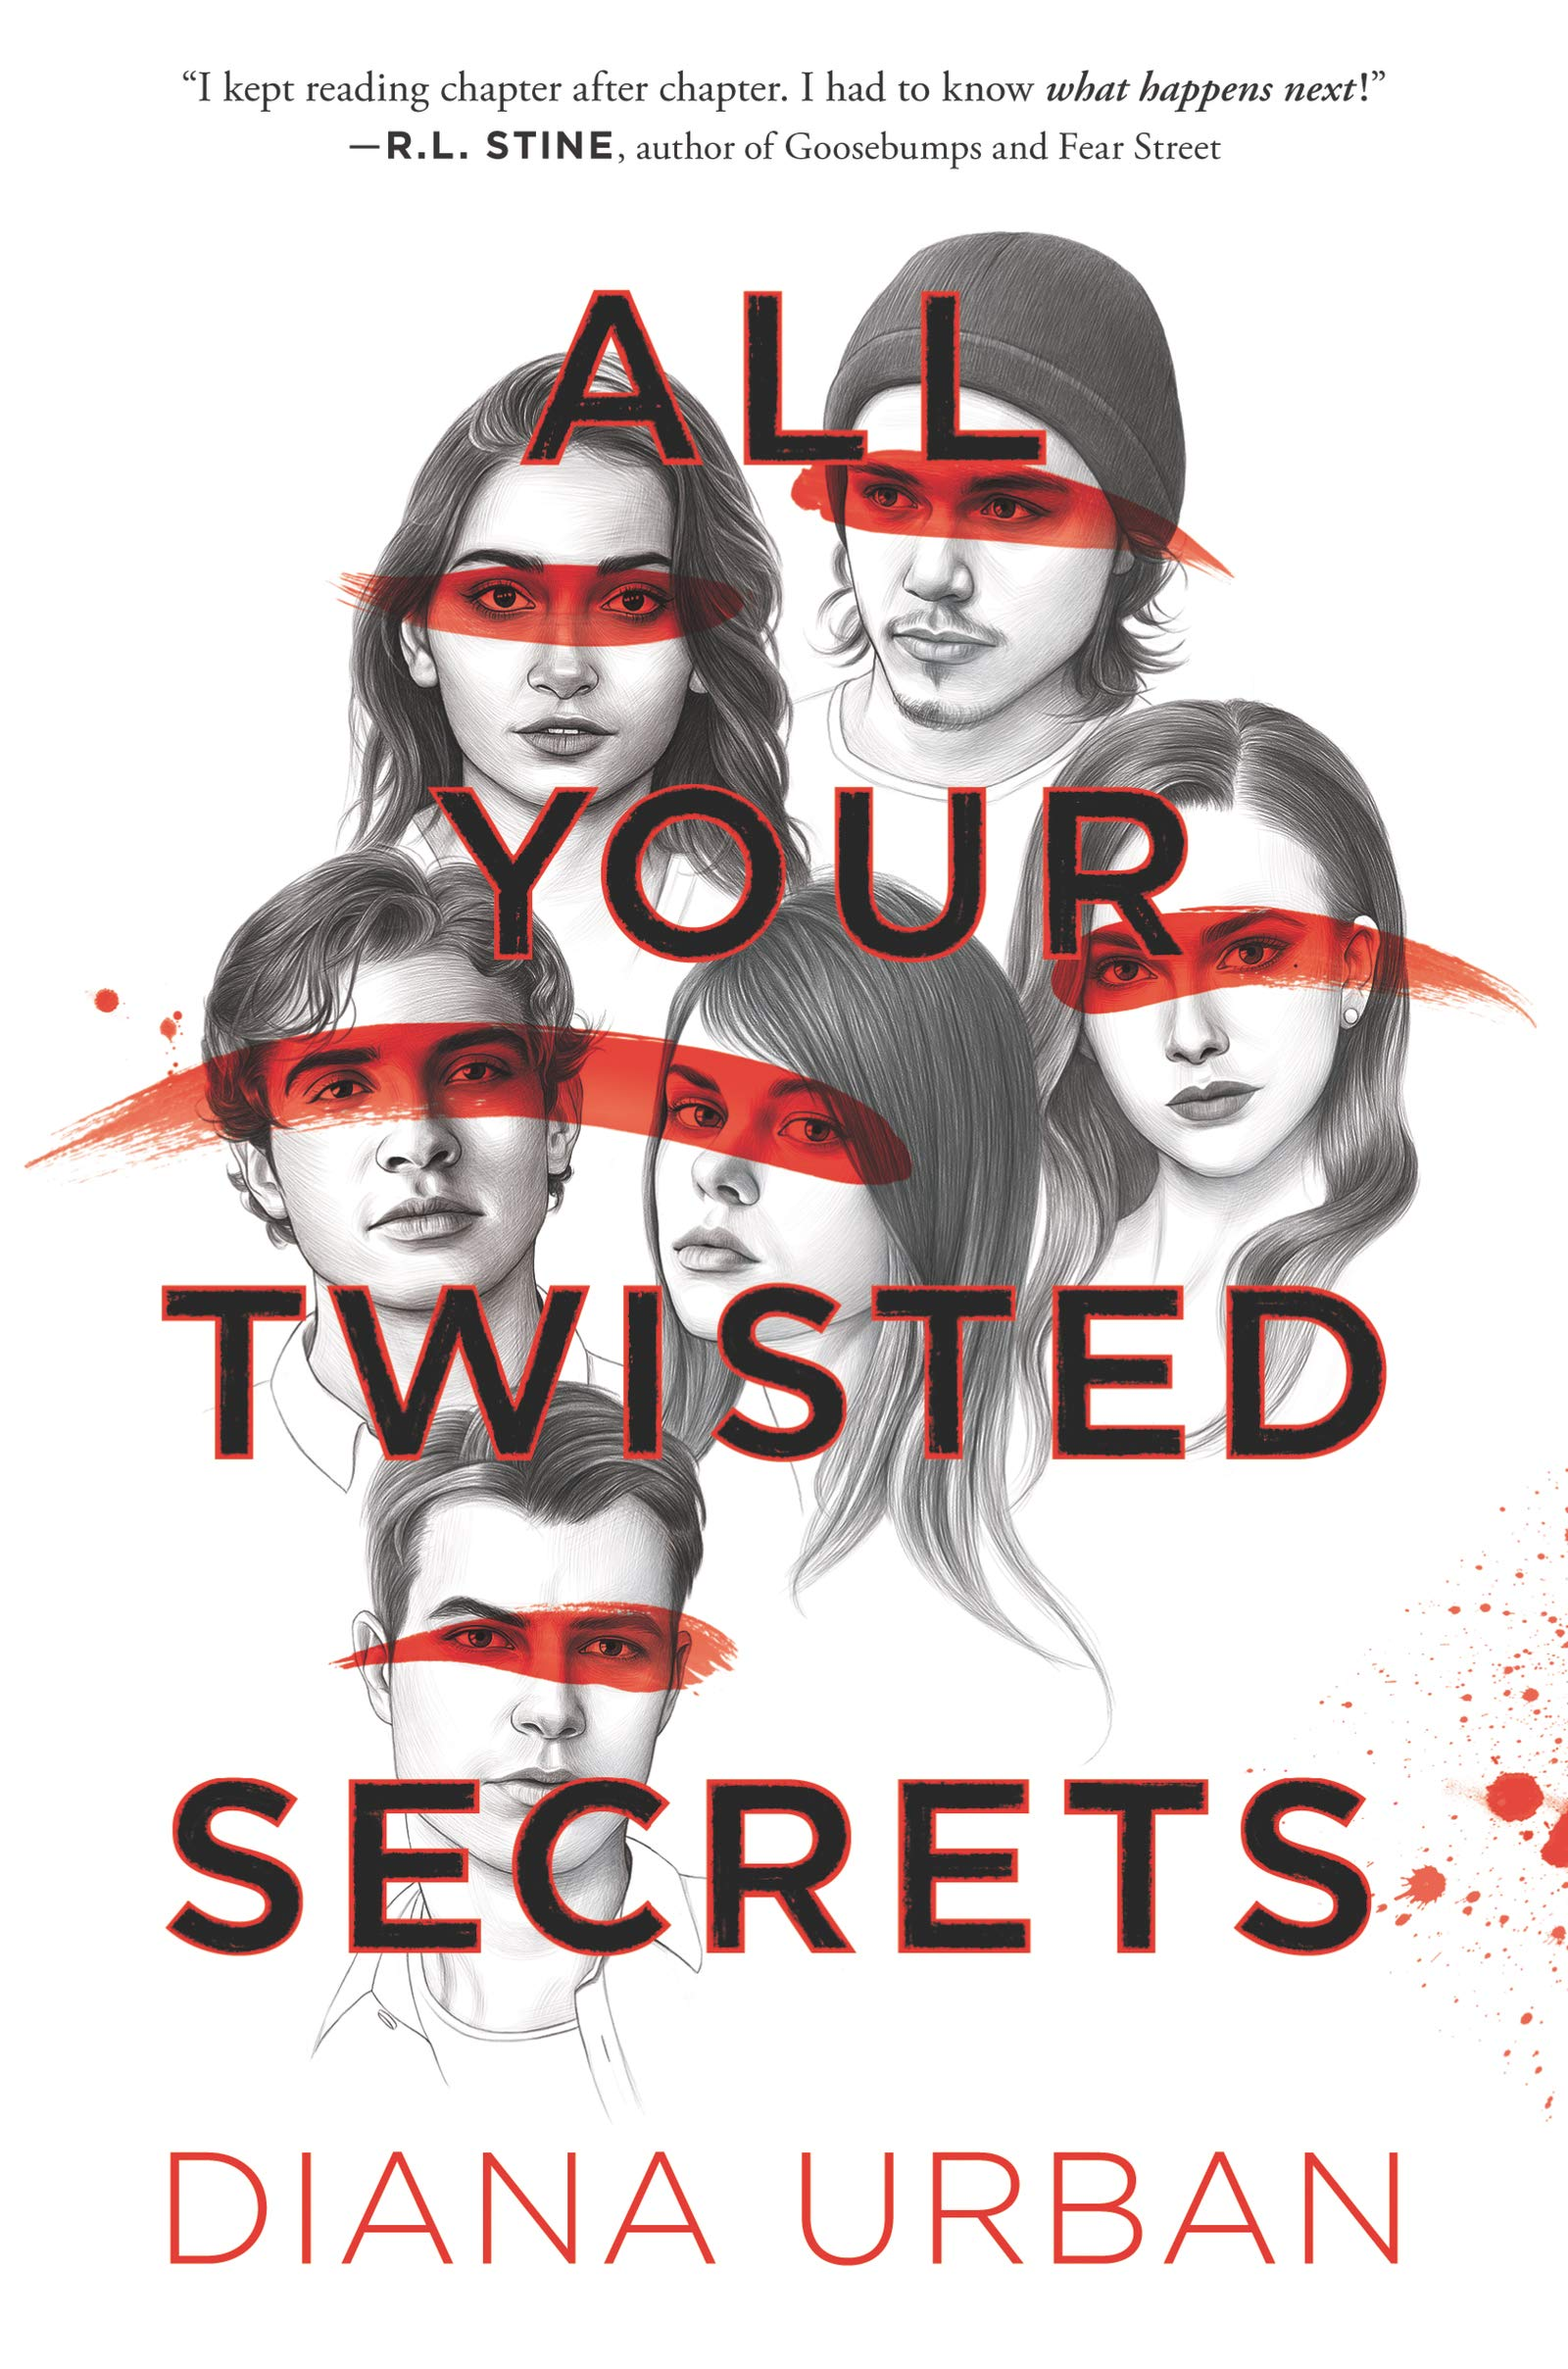 Amazon.com: All Your Twisted Secrets (9780062908216): Urban, Diana ...